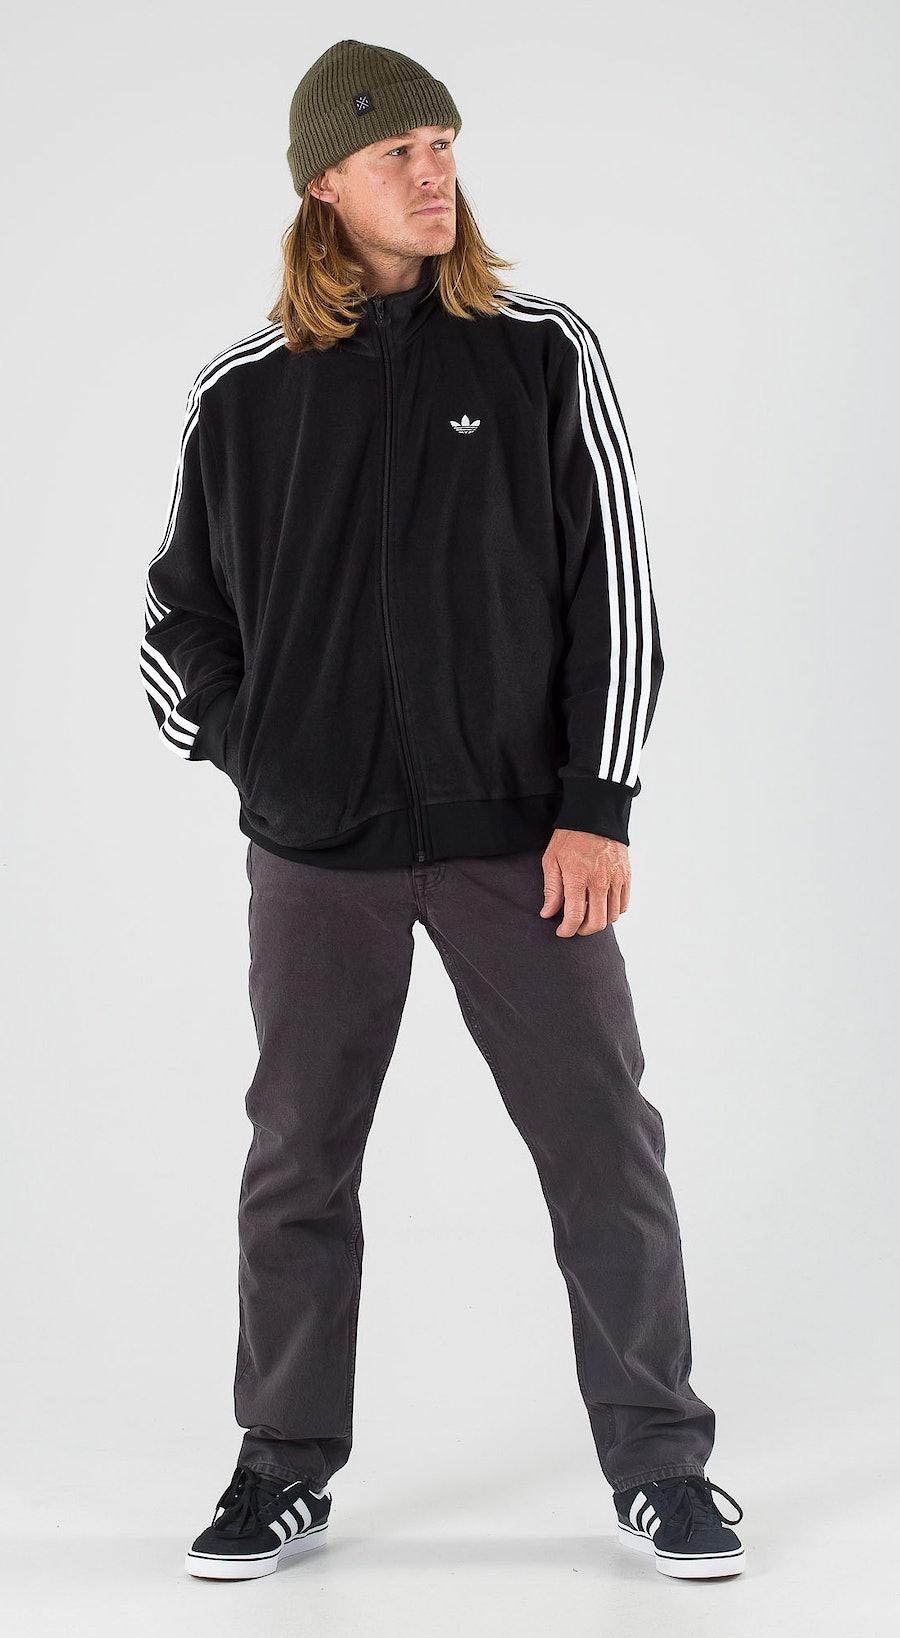 Adidas Skateboarding Bouclette Black/White Outfit Multi